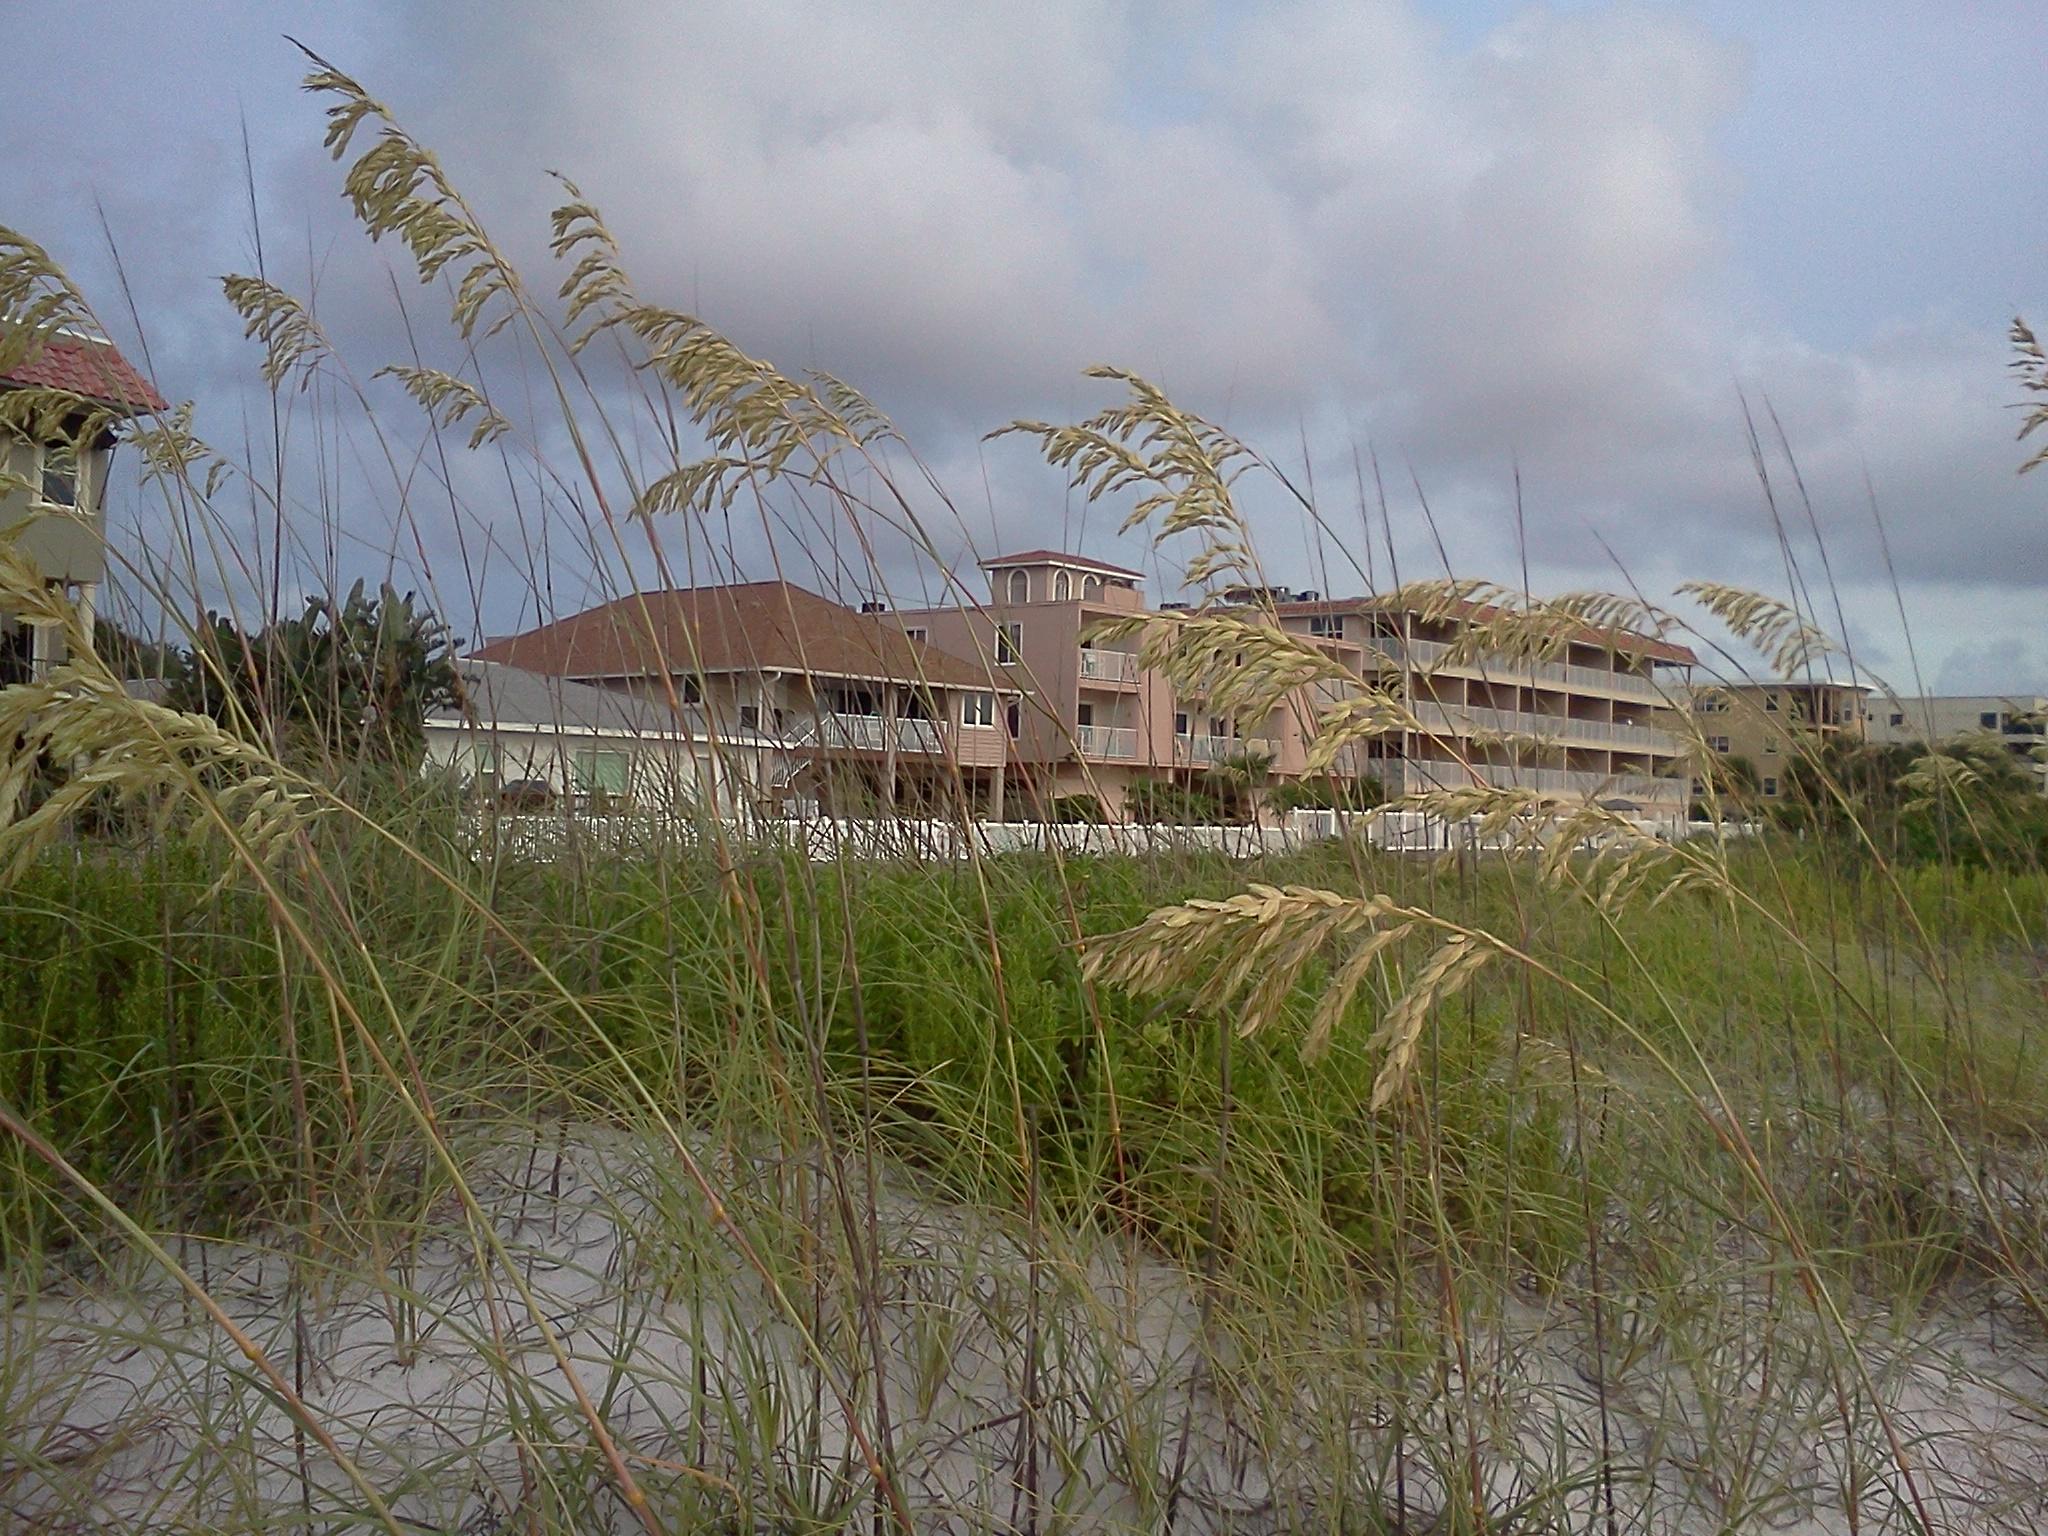 Clearwater, Florida heykip.com